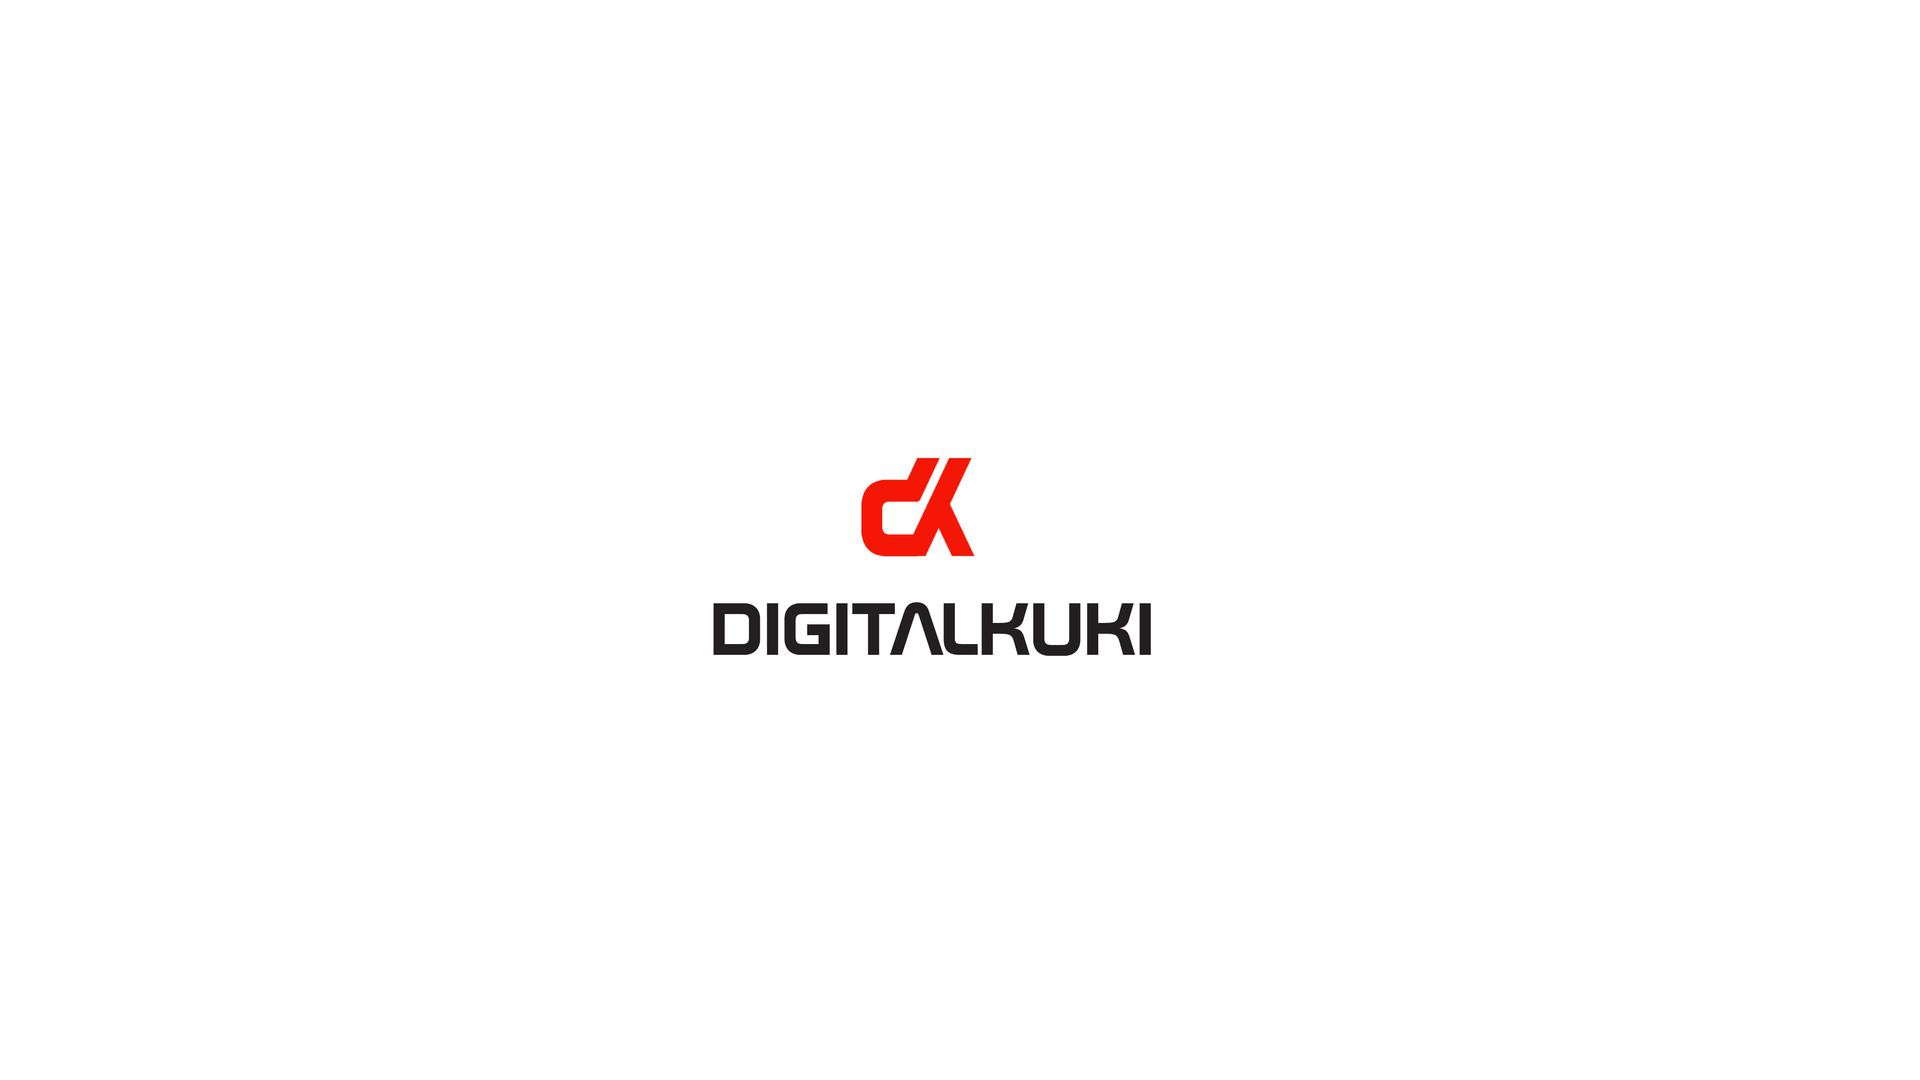 Digitalkuki